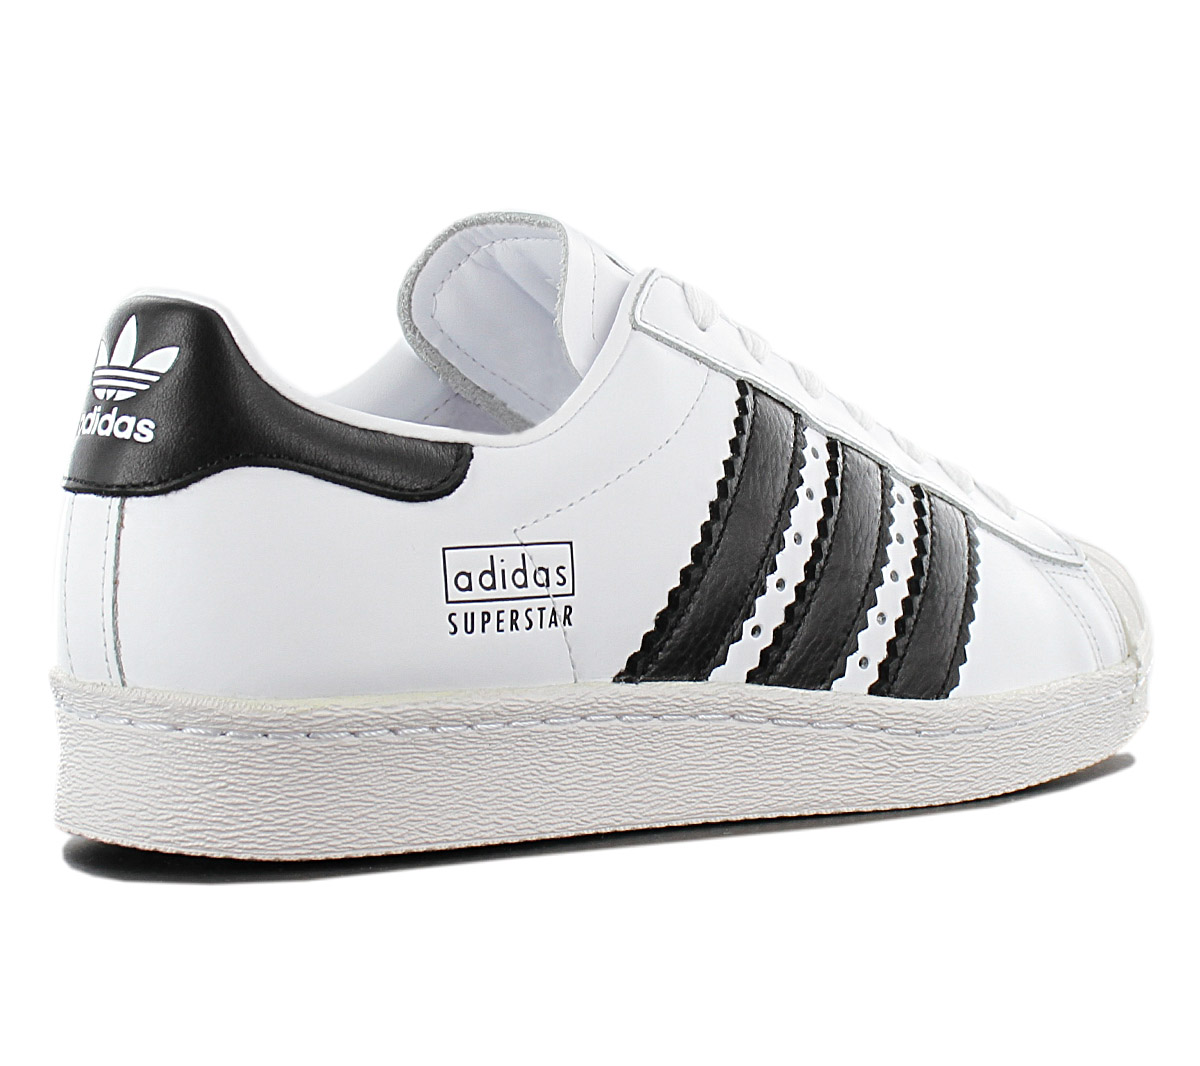 buy online 34a9f 29de3 Adidas Originals Superstar 80s Men s Sneakers Shoes Cg6496 Leather ...